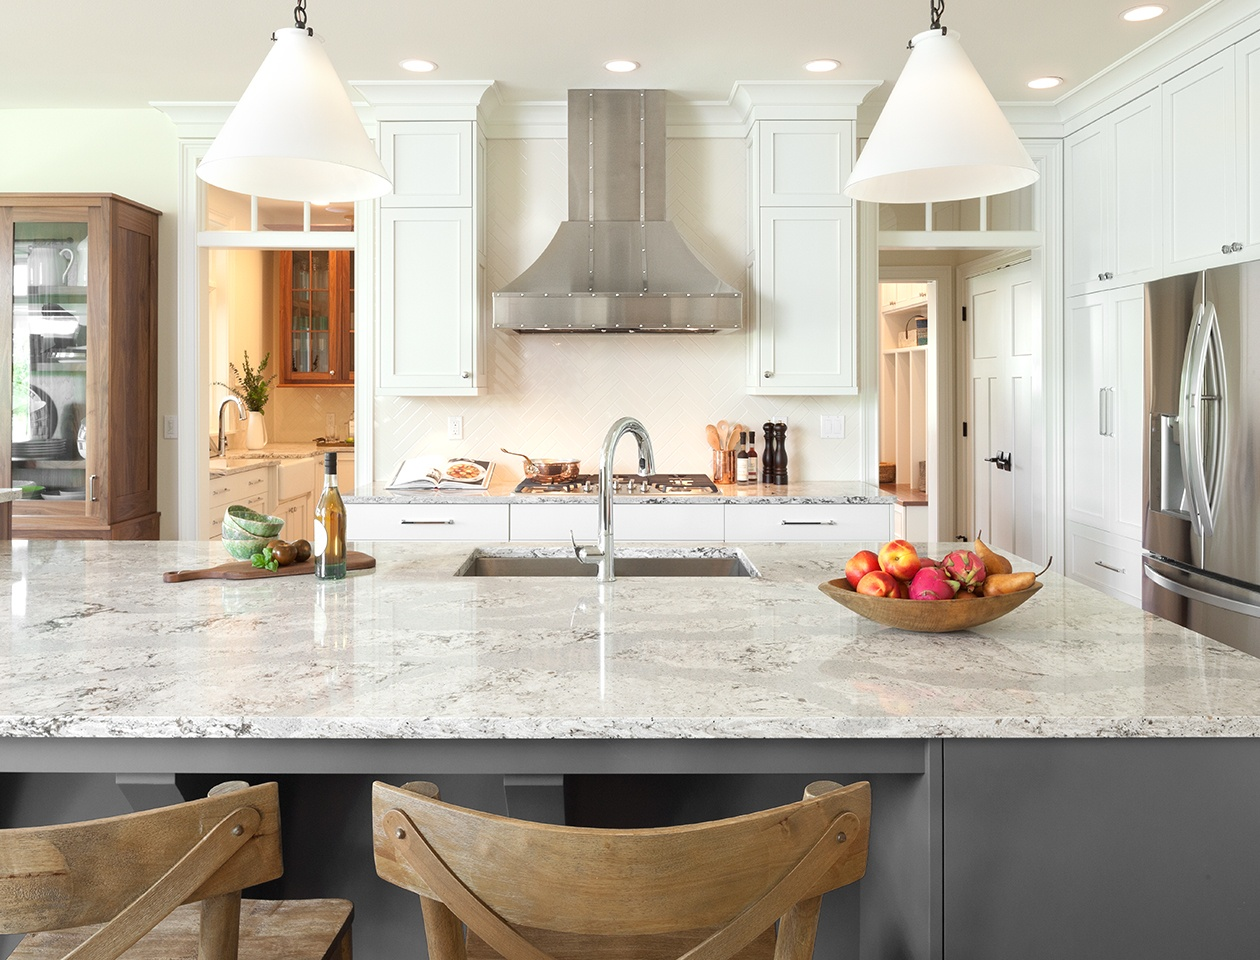 countertops kitchen tool crock 15 stunning quartz countertop colors to gather inspiration from 3 haze blend